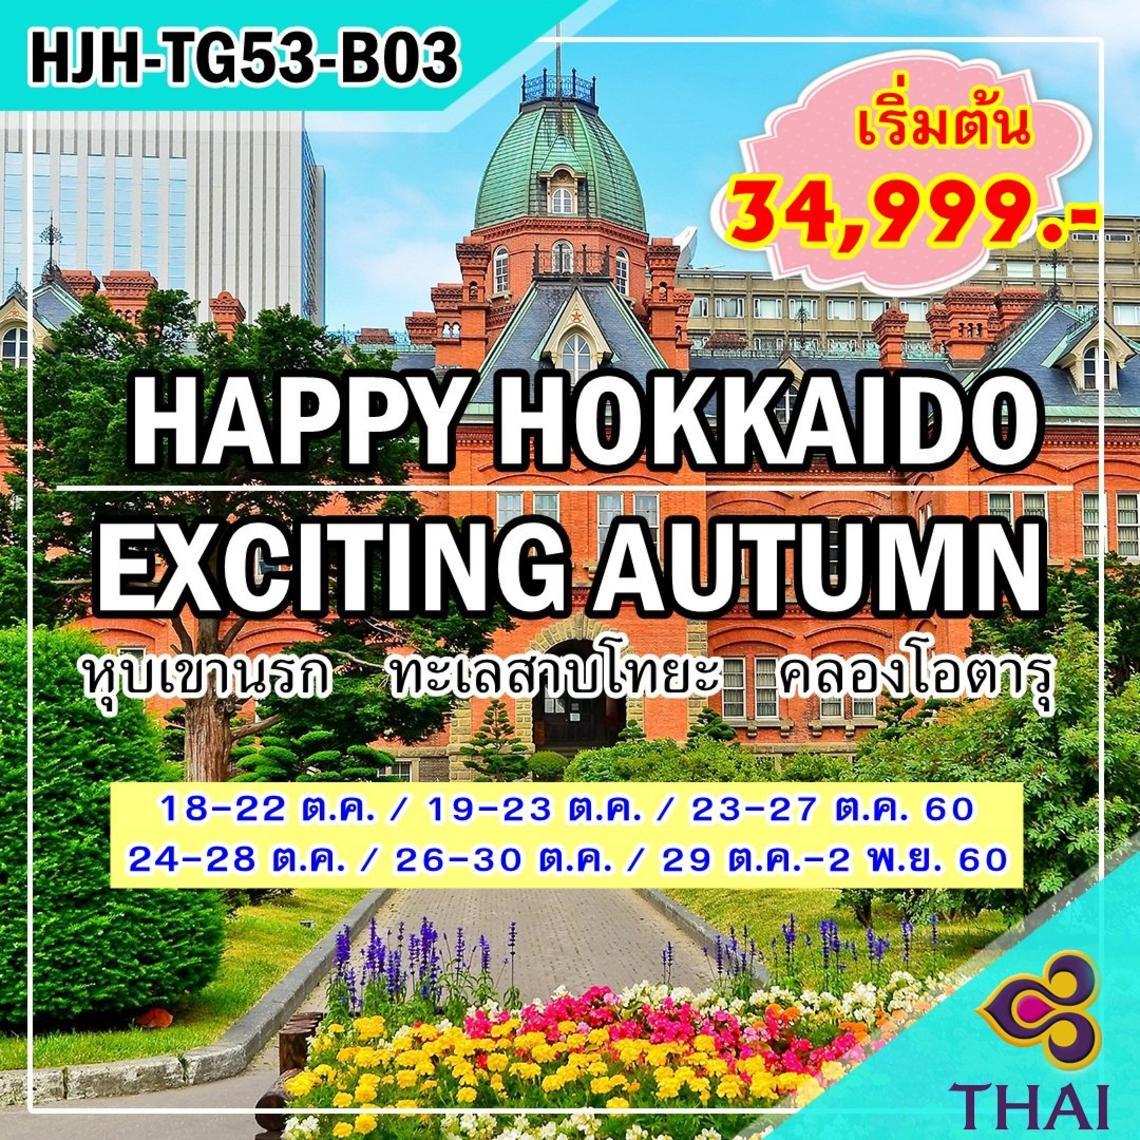 HJH-TG53-B03 HAPPY HOKKAIDO EXCITING AUTUMN 5D3N